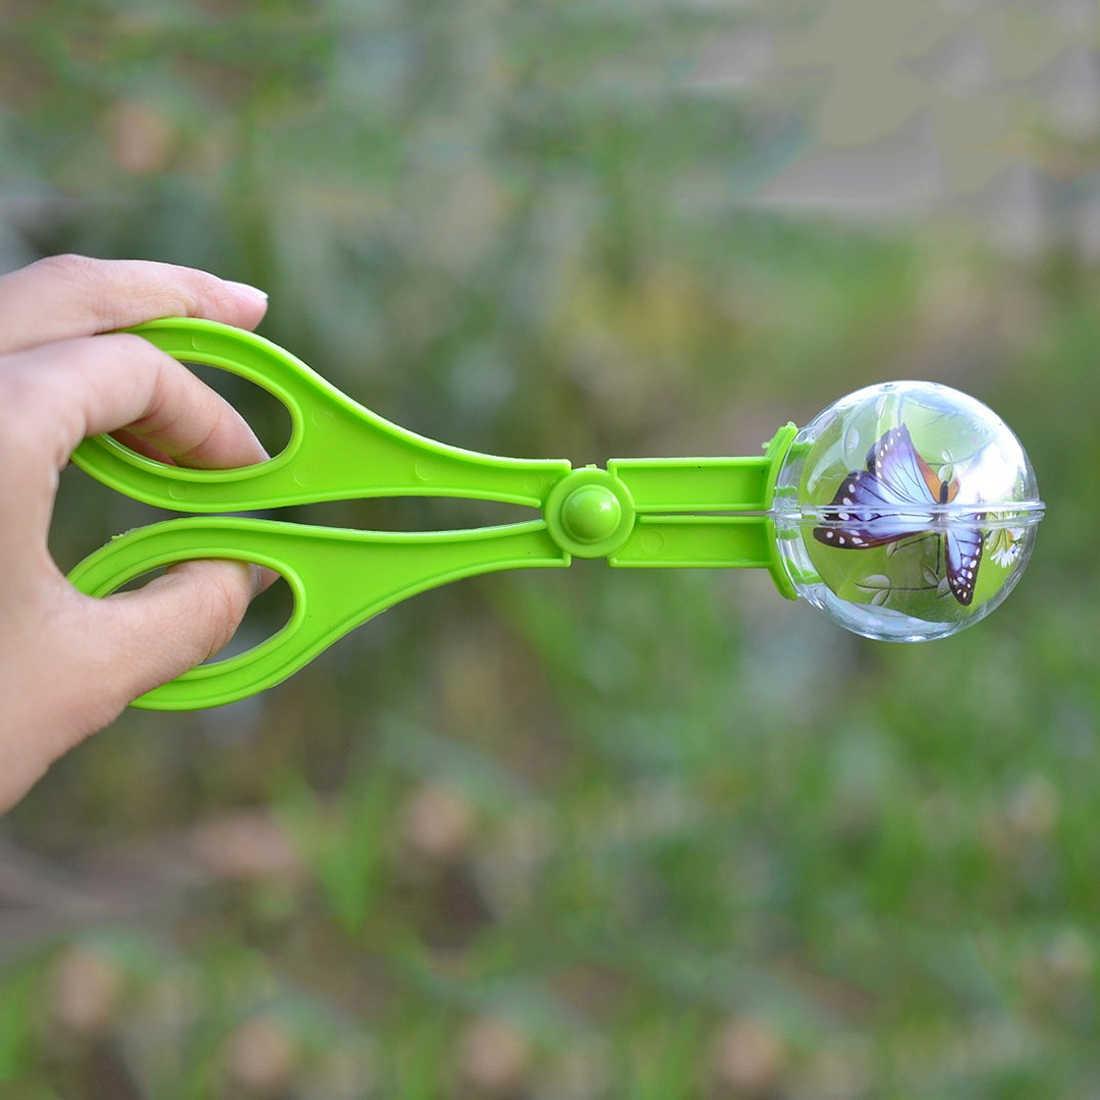 Perangkap Serangga Plastik Bug Serangga Penangkap Gunting Penjepit Pinset untuk Anak-anak Anak Mainan Berguna